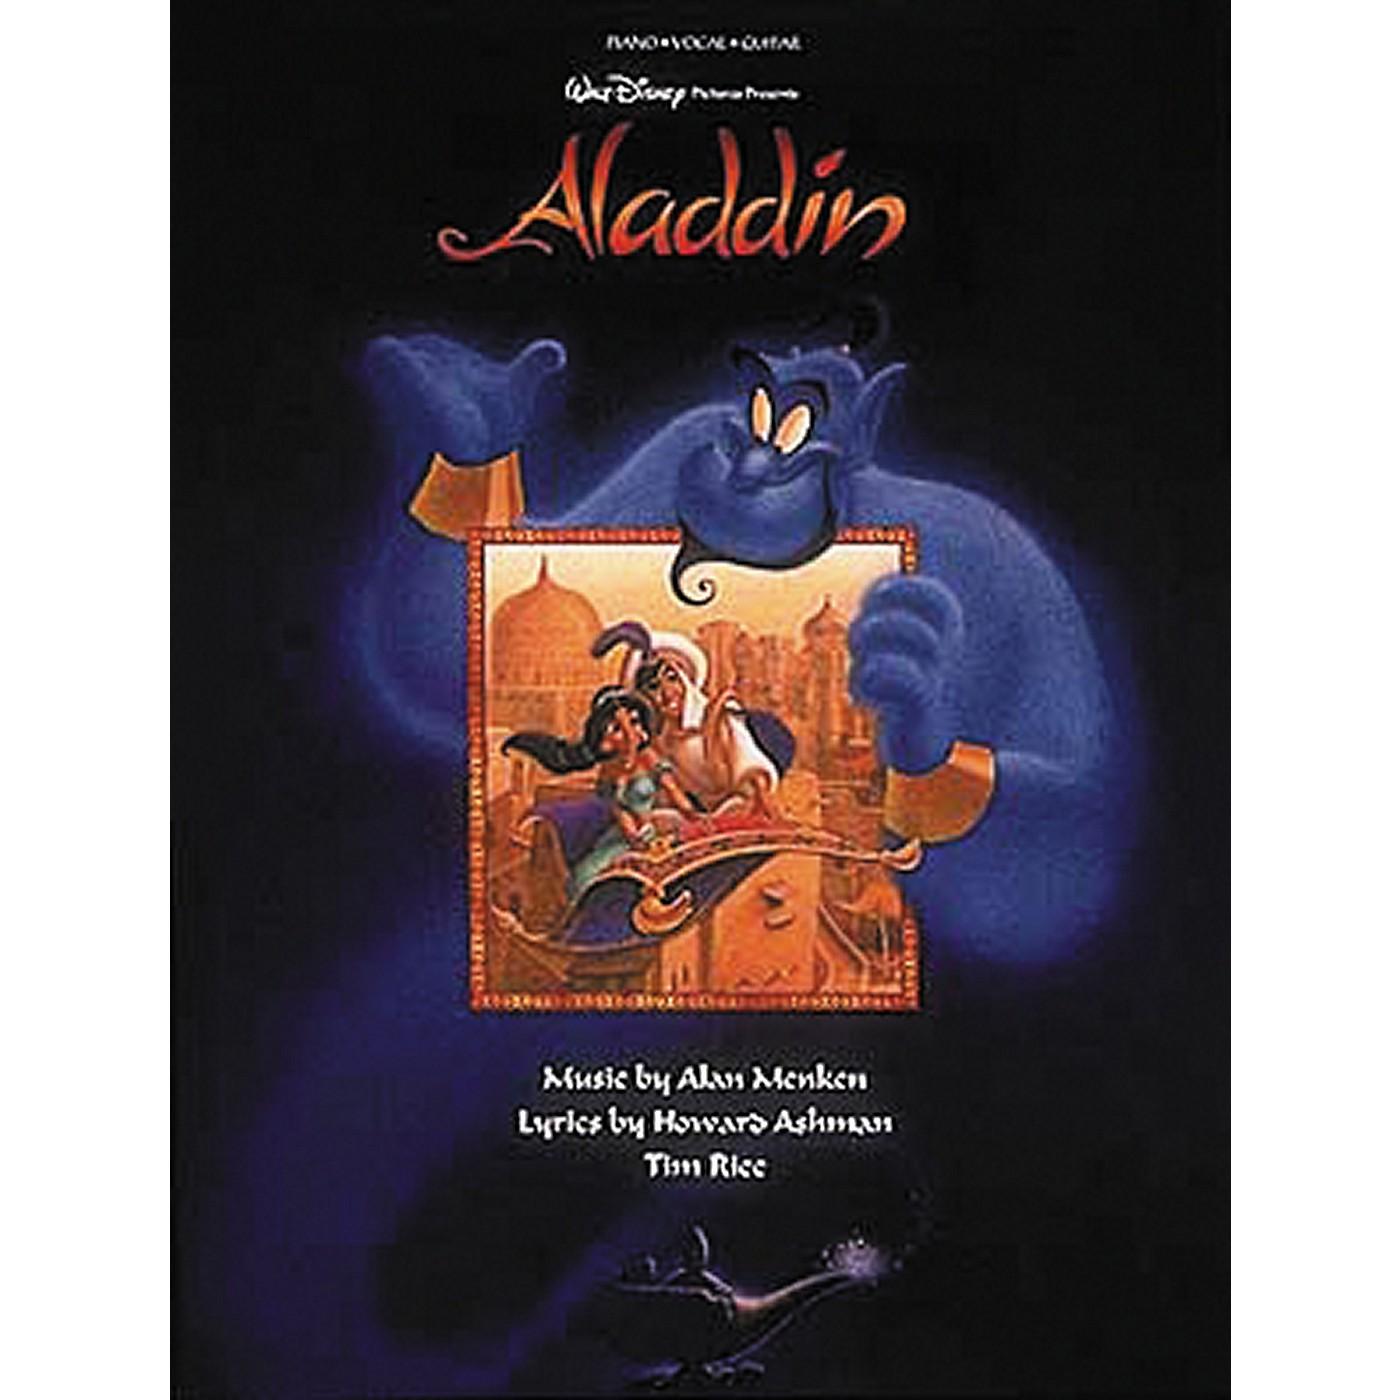 Hal Leonard Aladdin Piano, Vocal, Guitar Songbook thumbnail